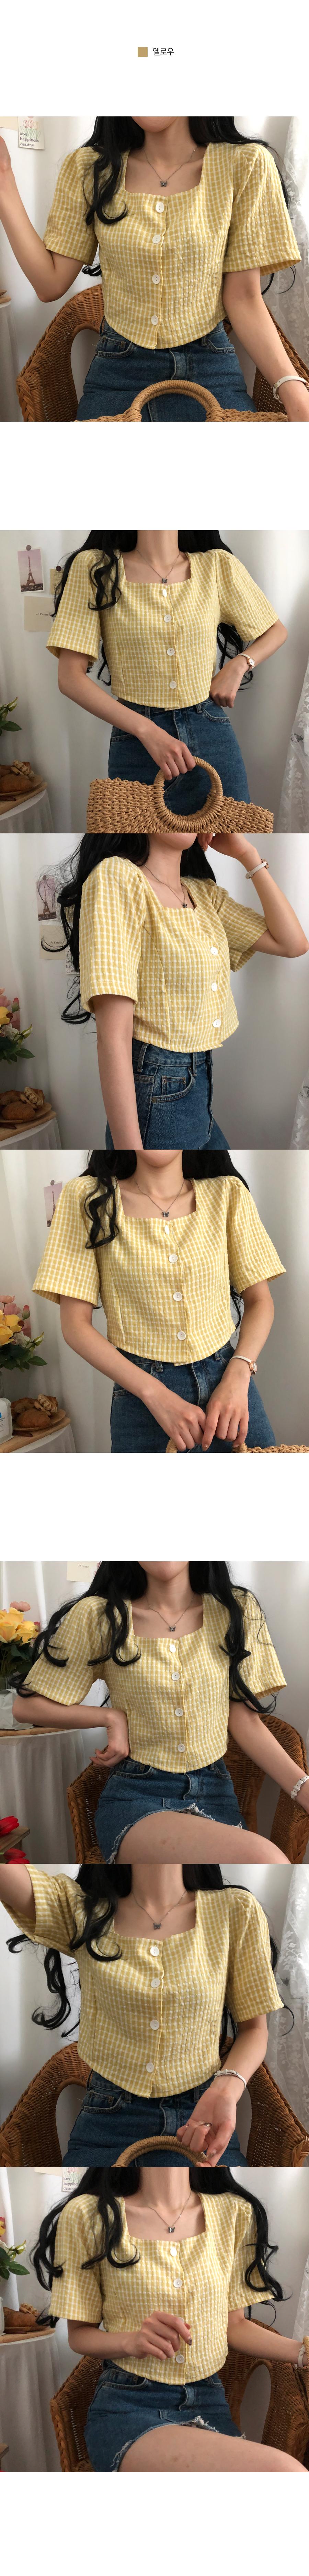 tiara square neck check cropped blouse